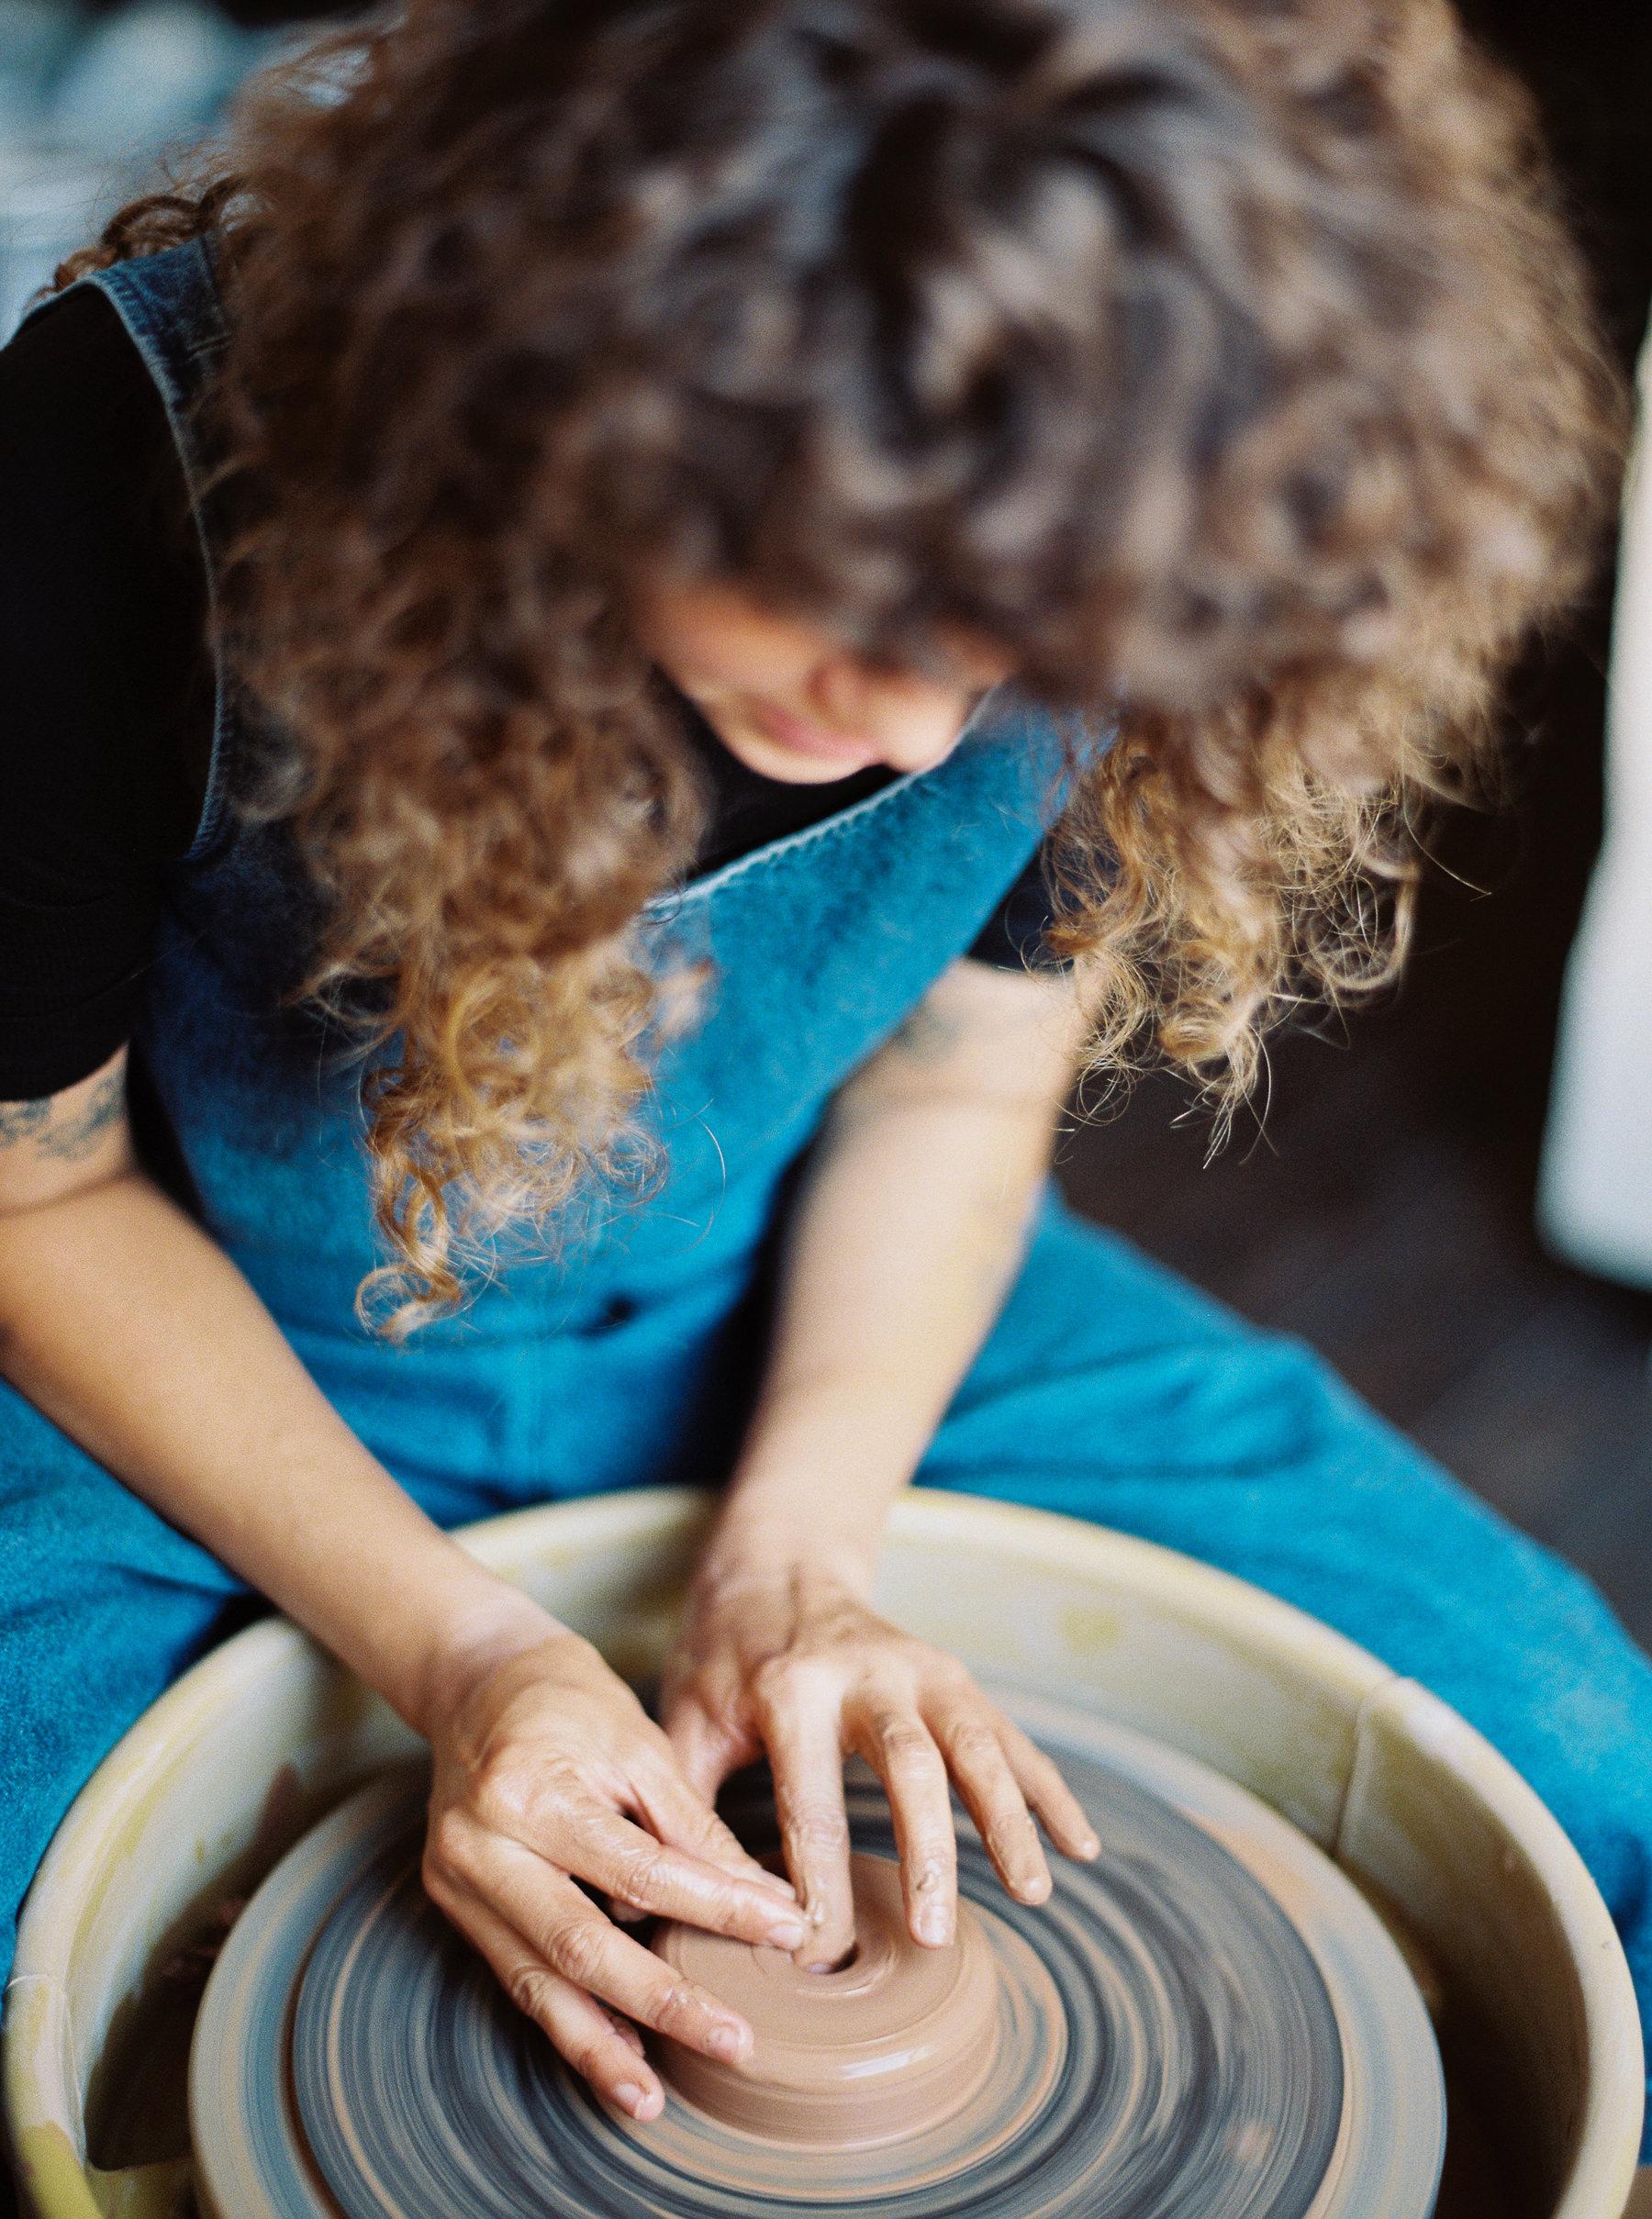 artistprofile-katherinemoes-pottery-annapeters-annapetersphoto-unearthing.tc-4.jpg